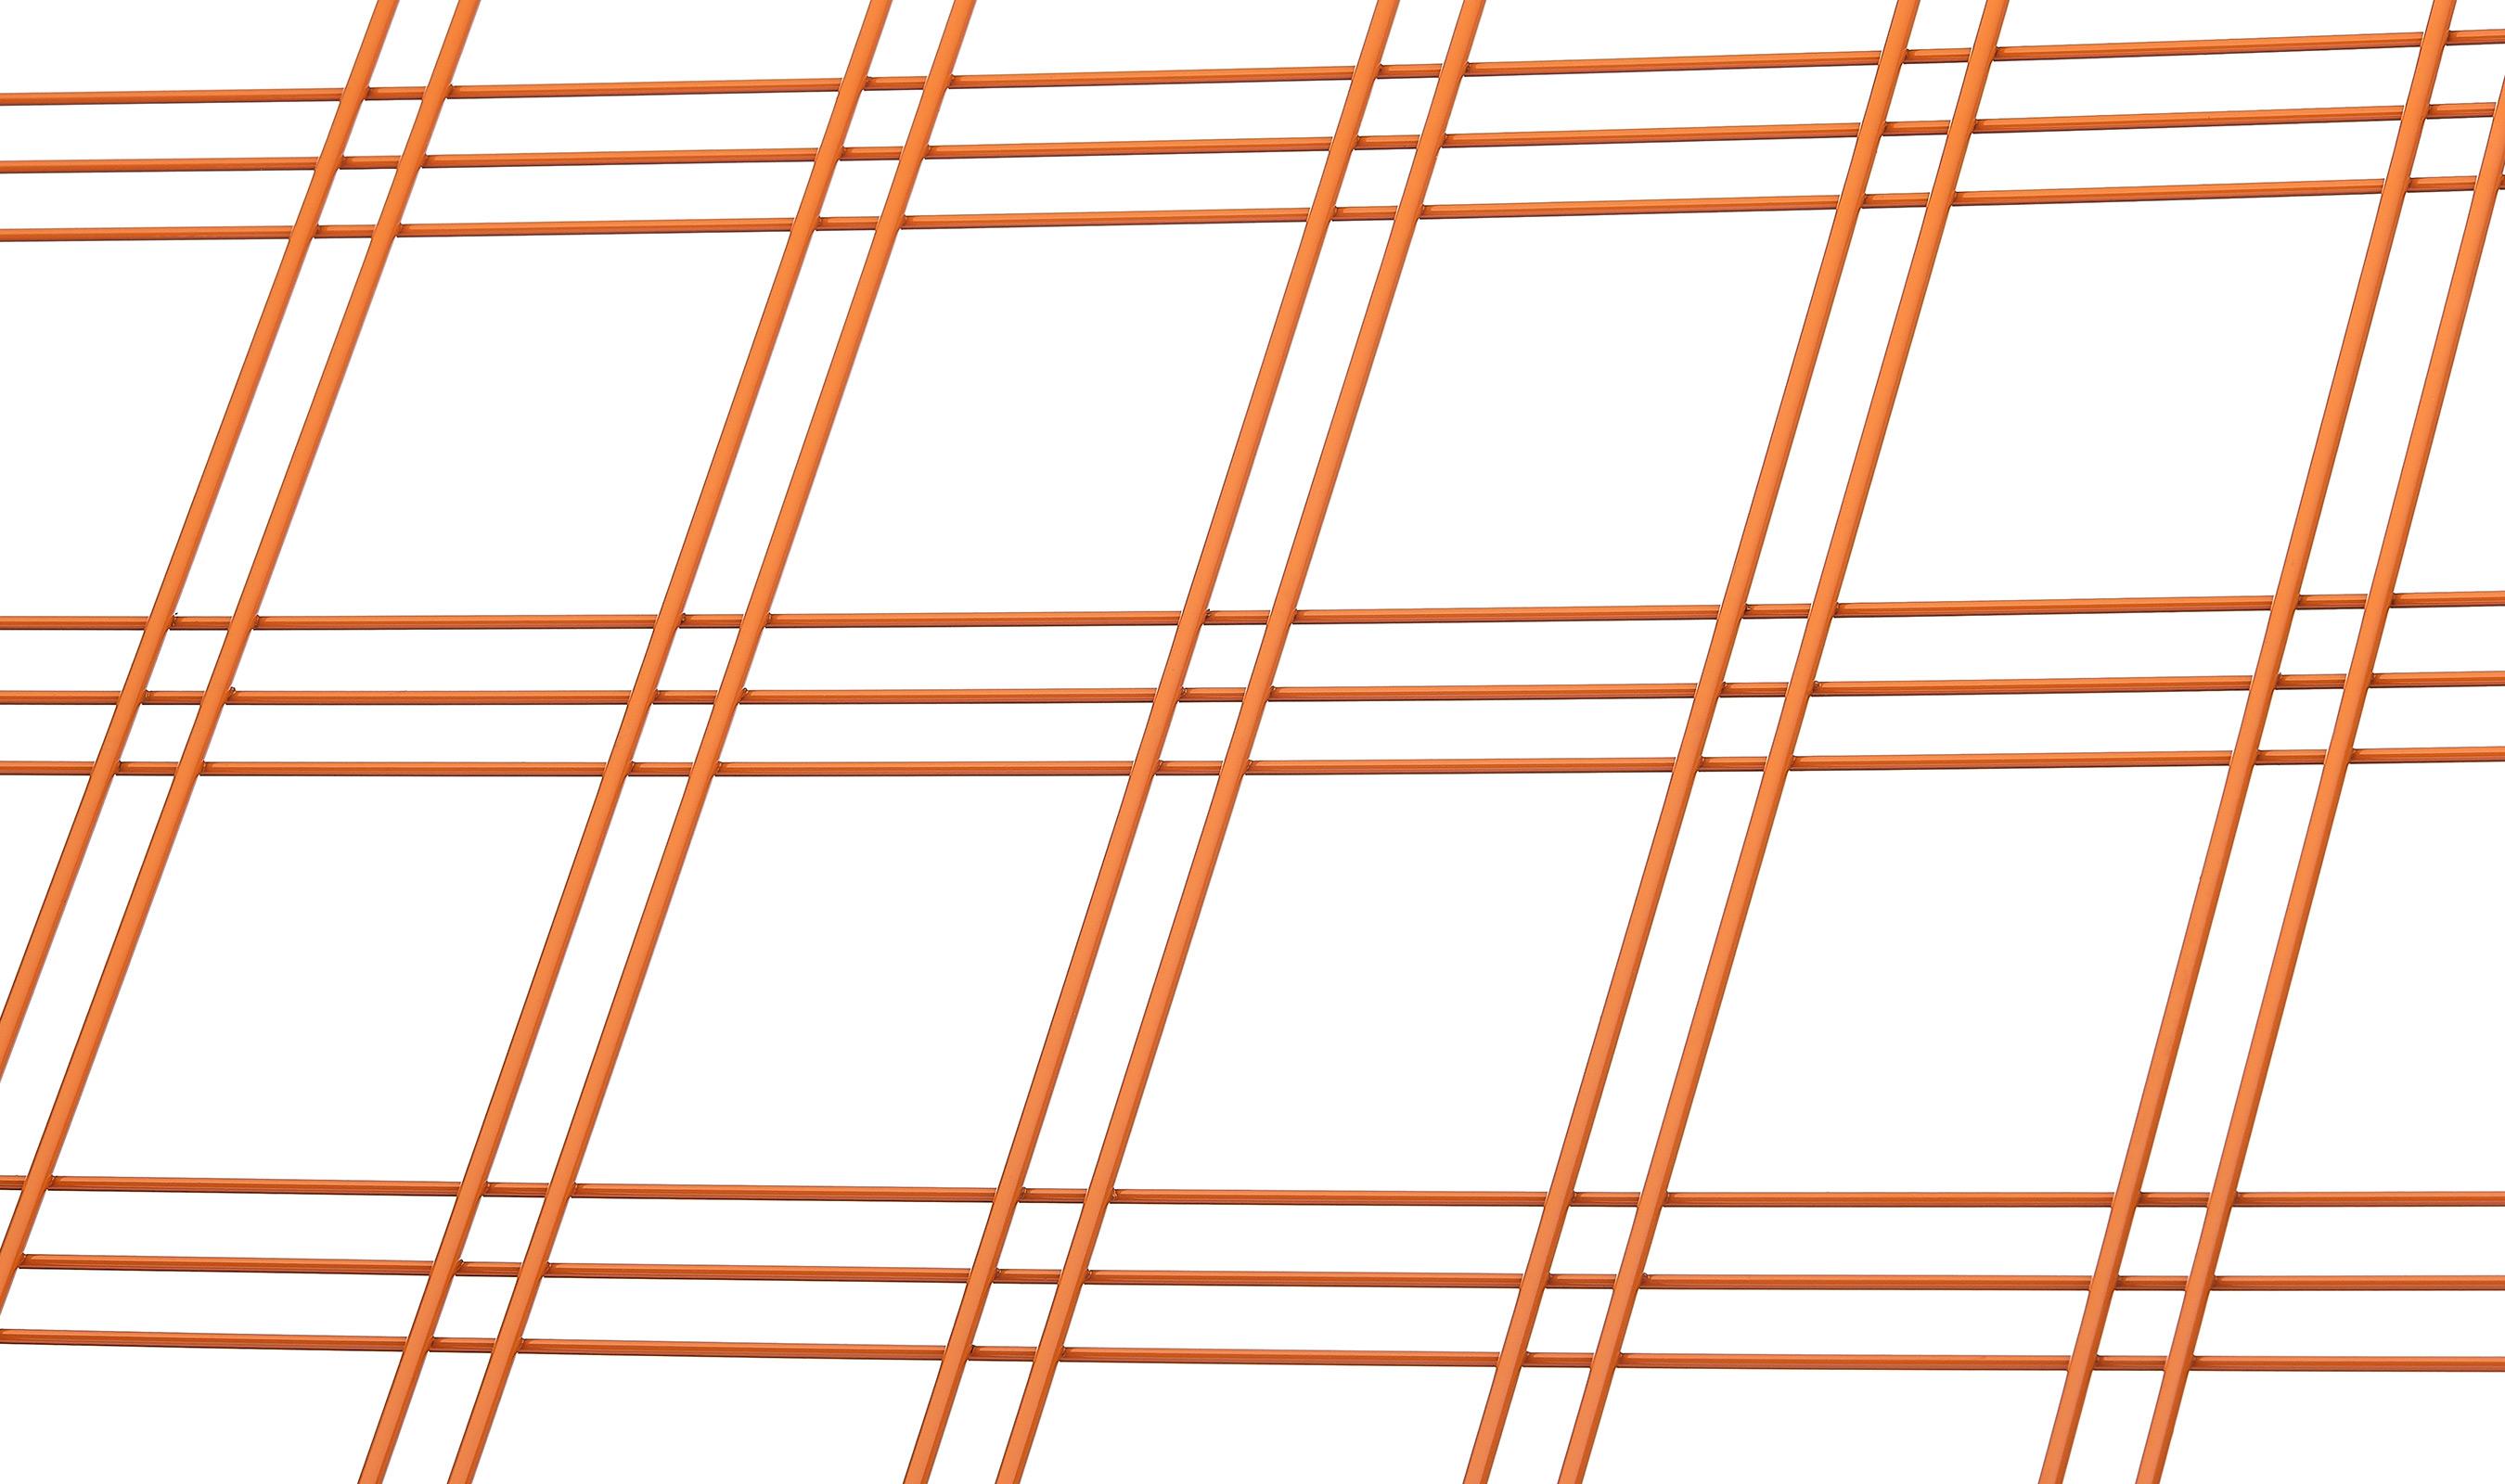 WDZ-542 Ornamental Welded Wire Mesh